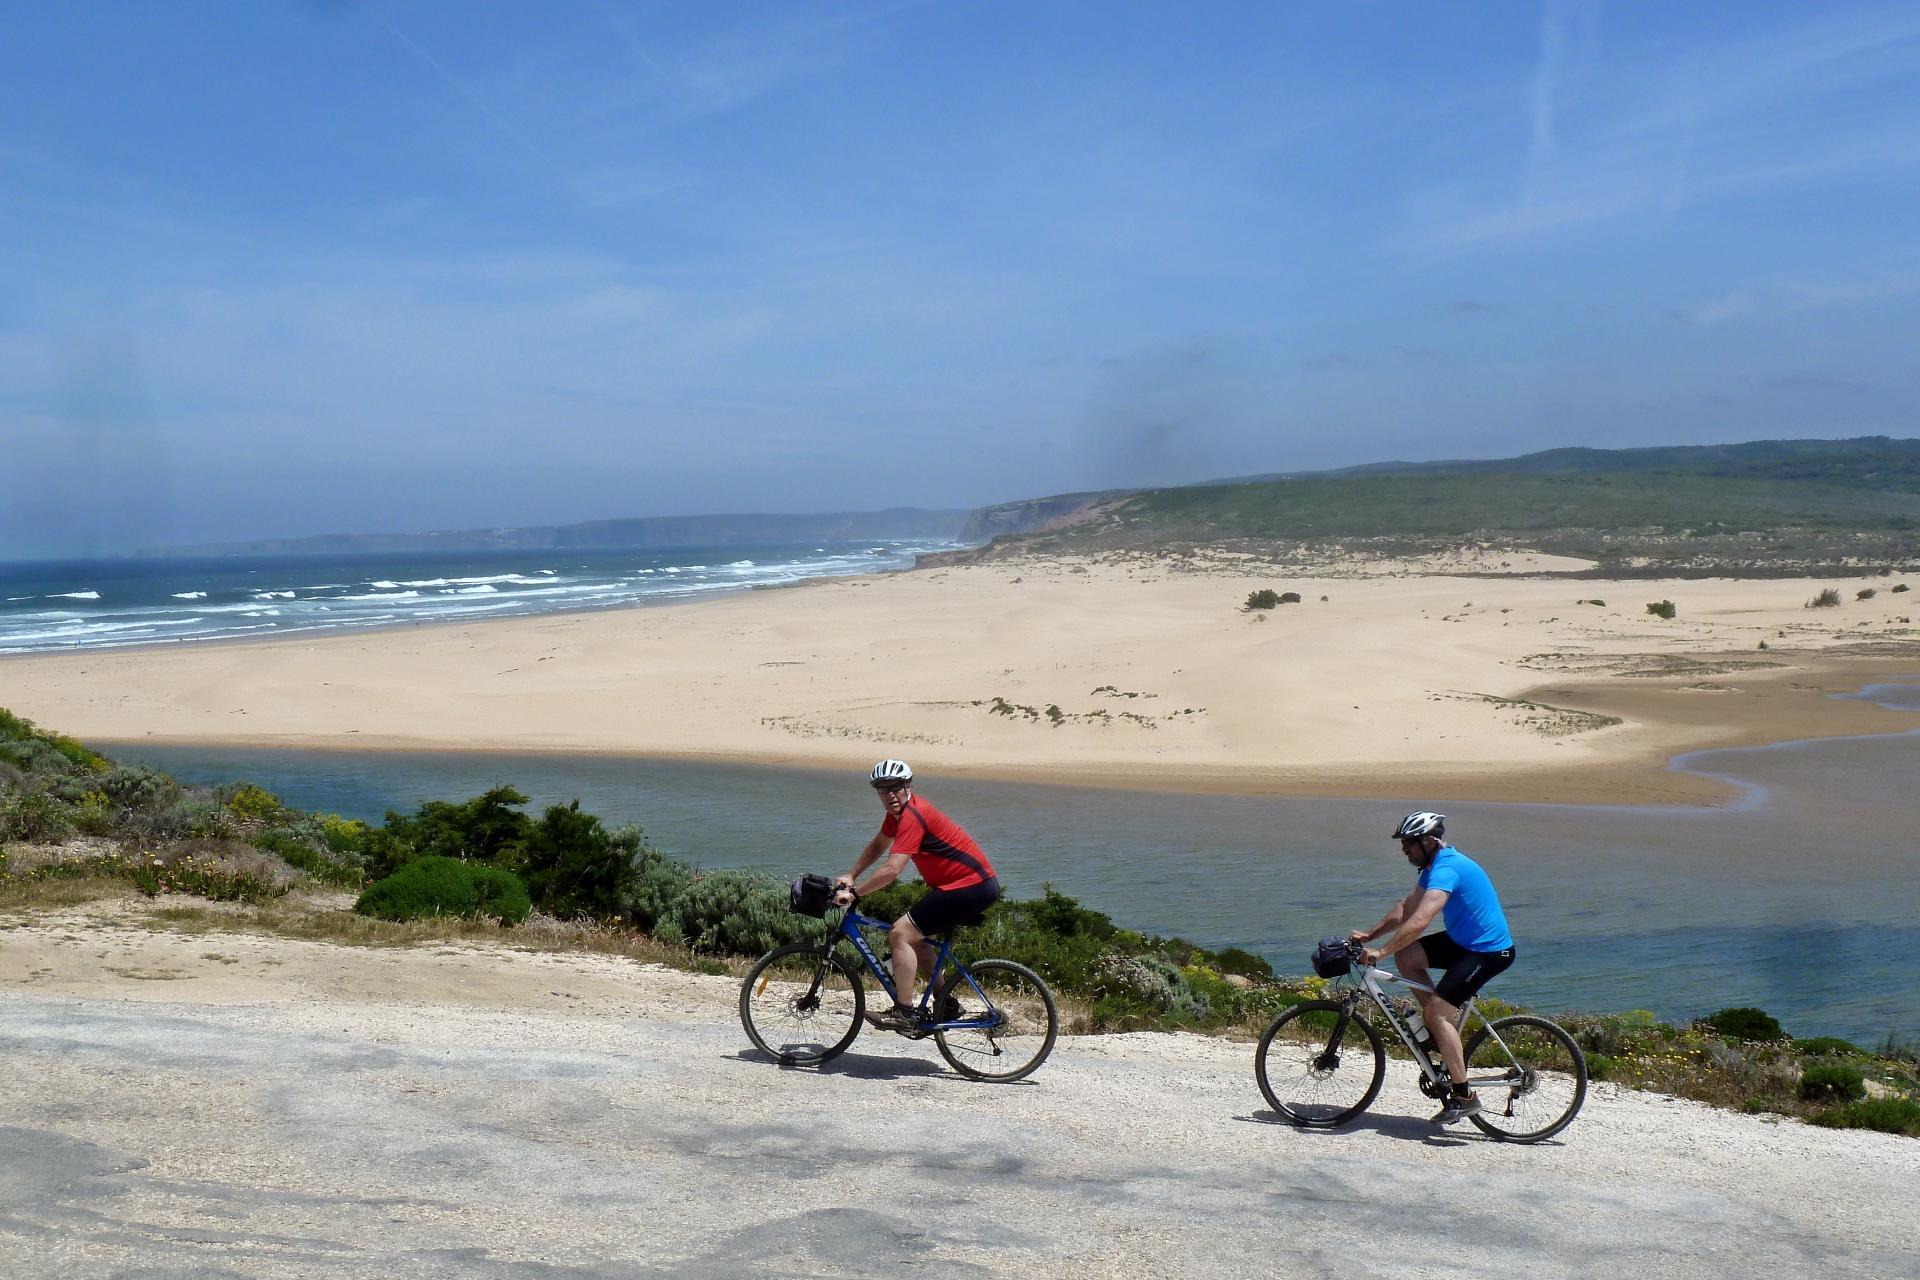 Bicycle tour in Portugal Alentejo Coast to Algarve cycling